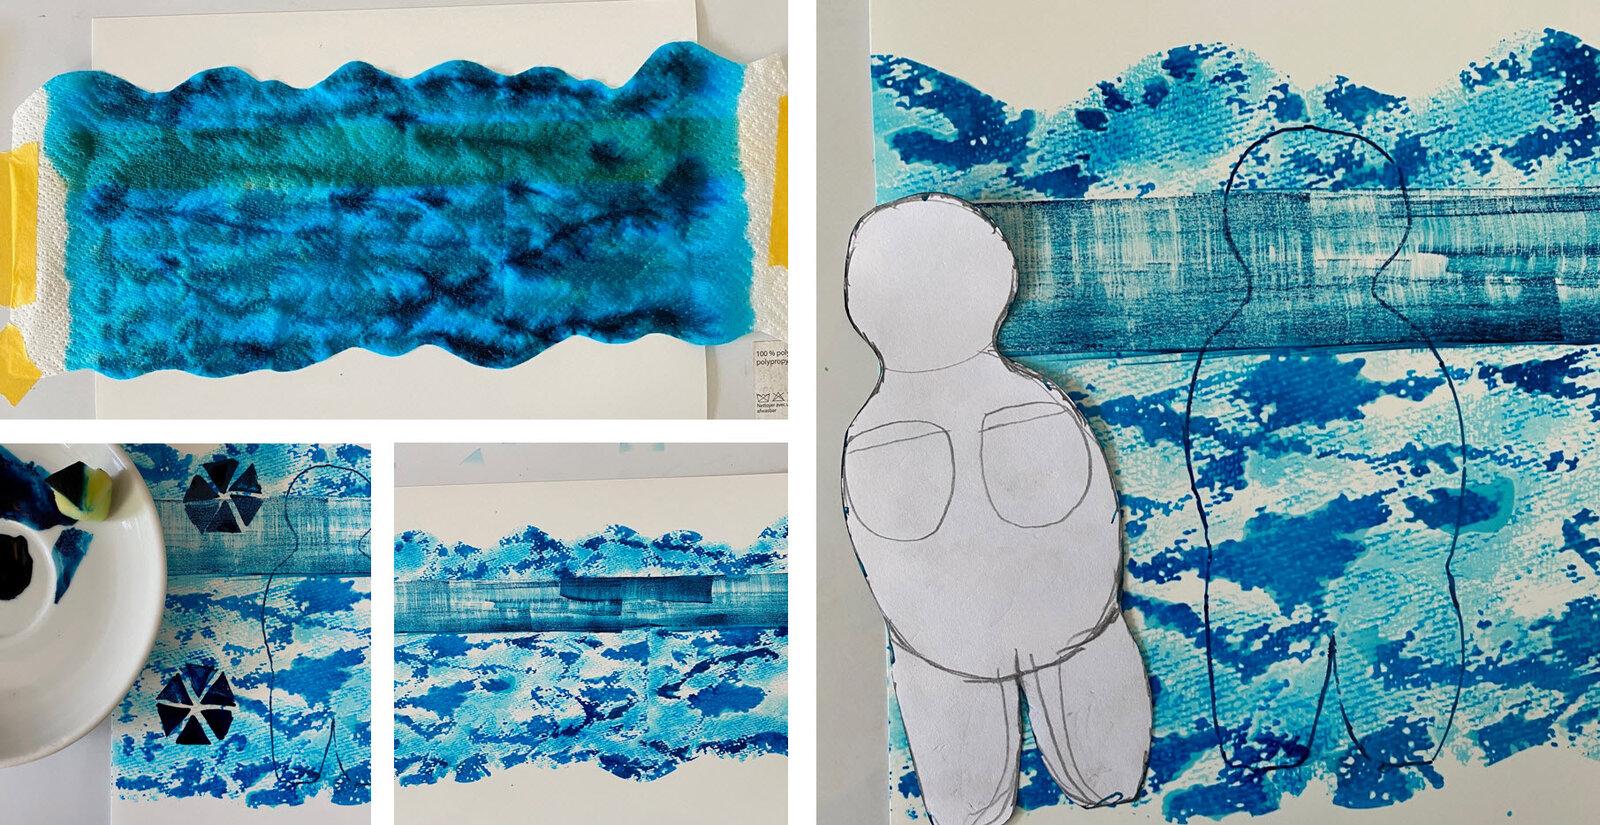 jacques herbin - bleu austral - collage.jpeg